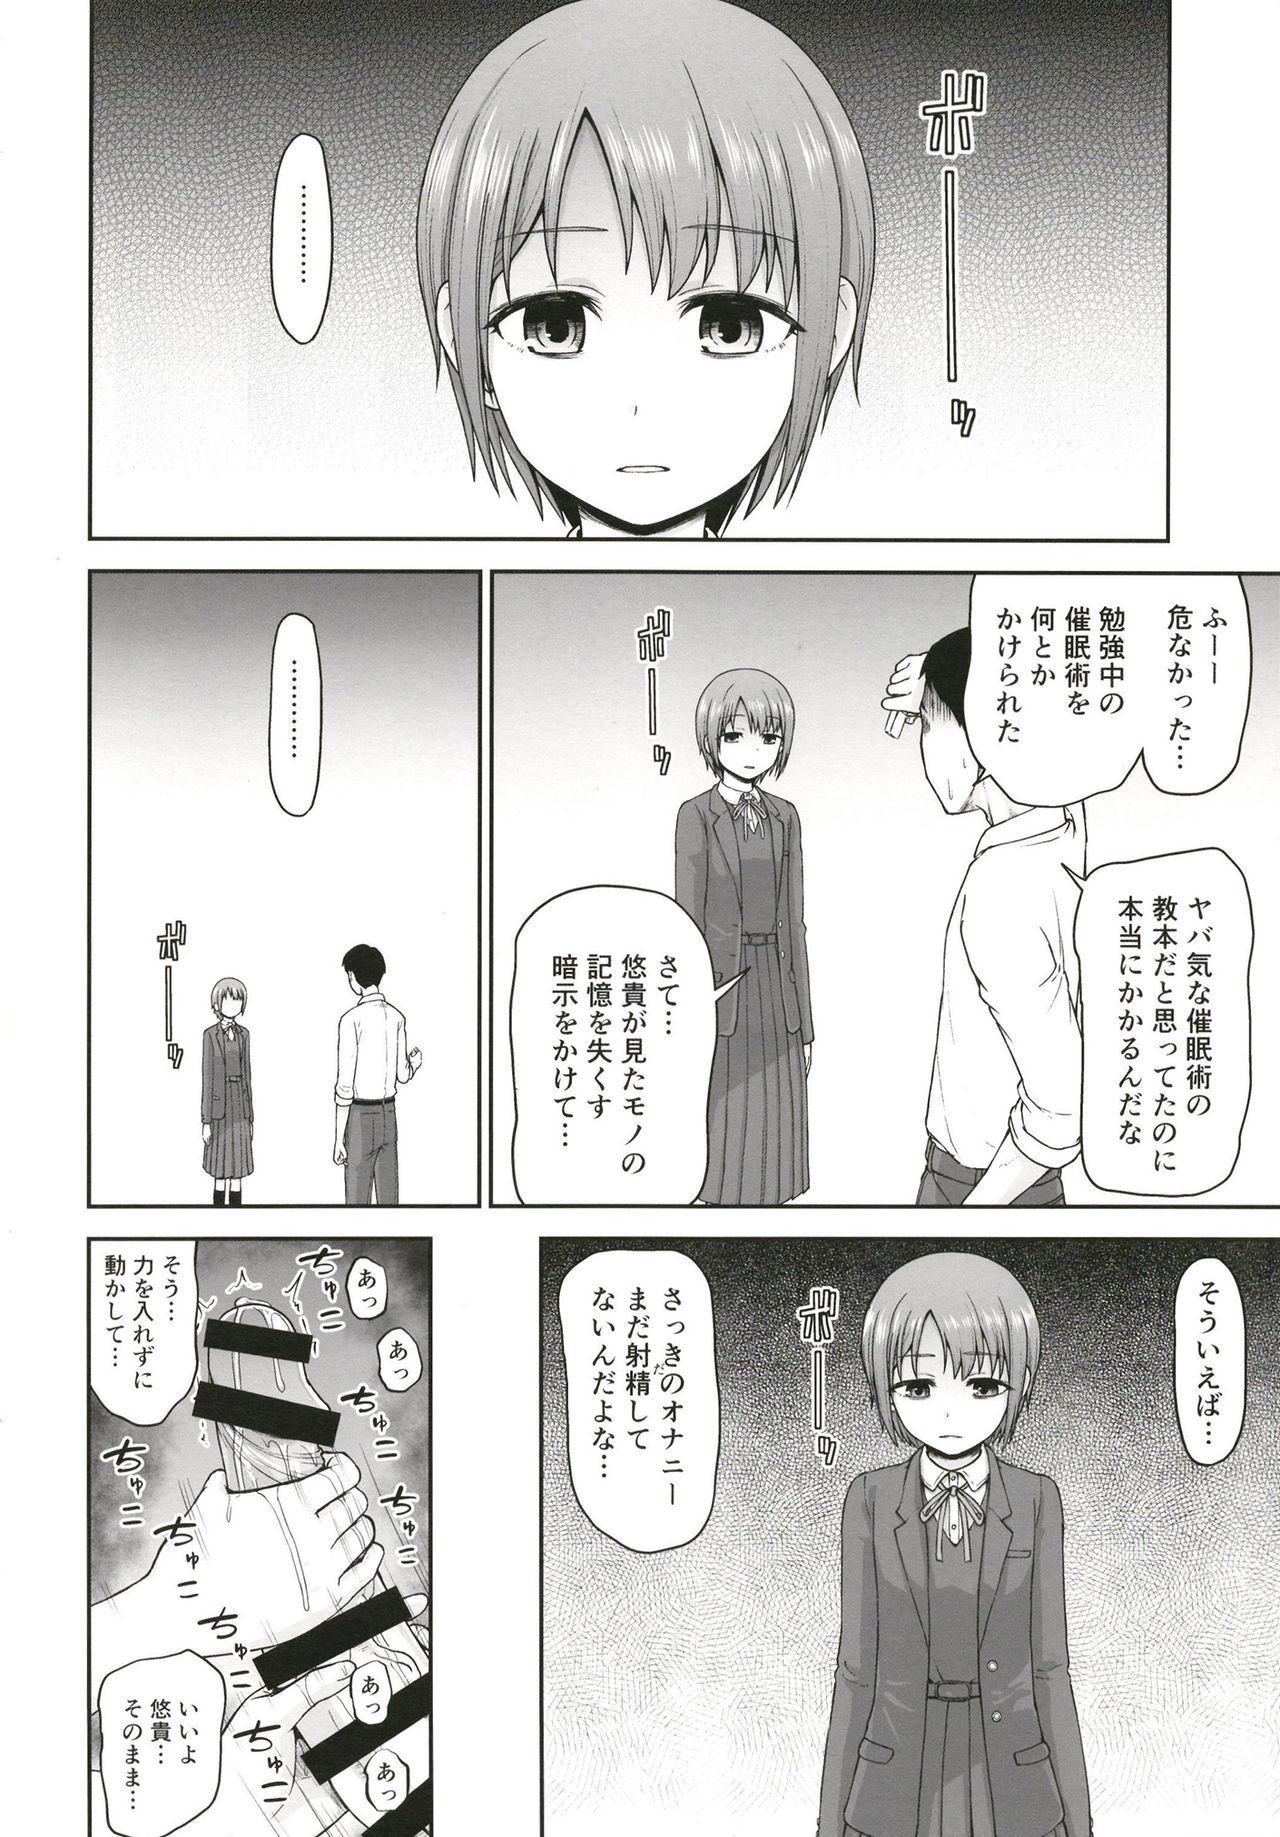 [Koppun (Hone)] Mifune-san to Otokura-chan to Saimin Sex (THE IDOLM@STER CINDERELLA GIRLS) [Digital] 3